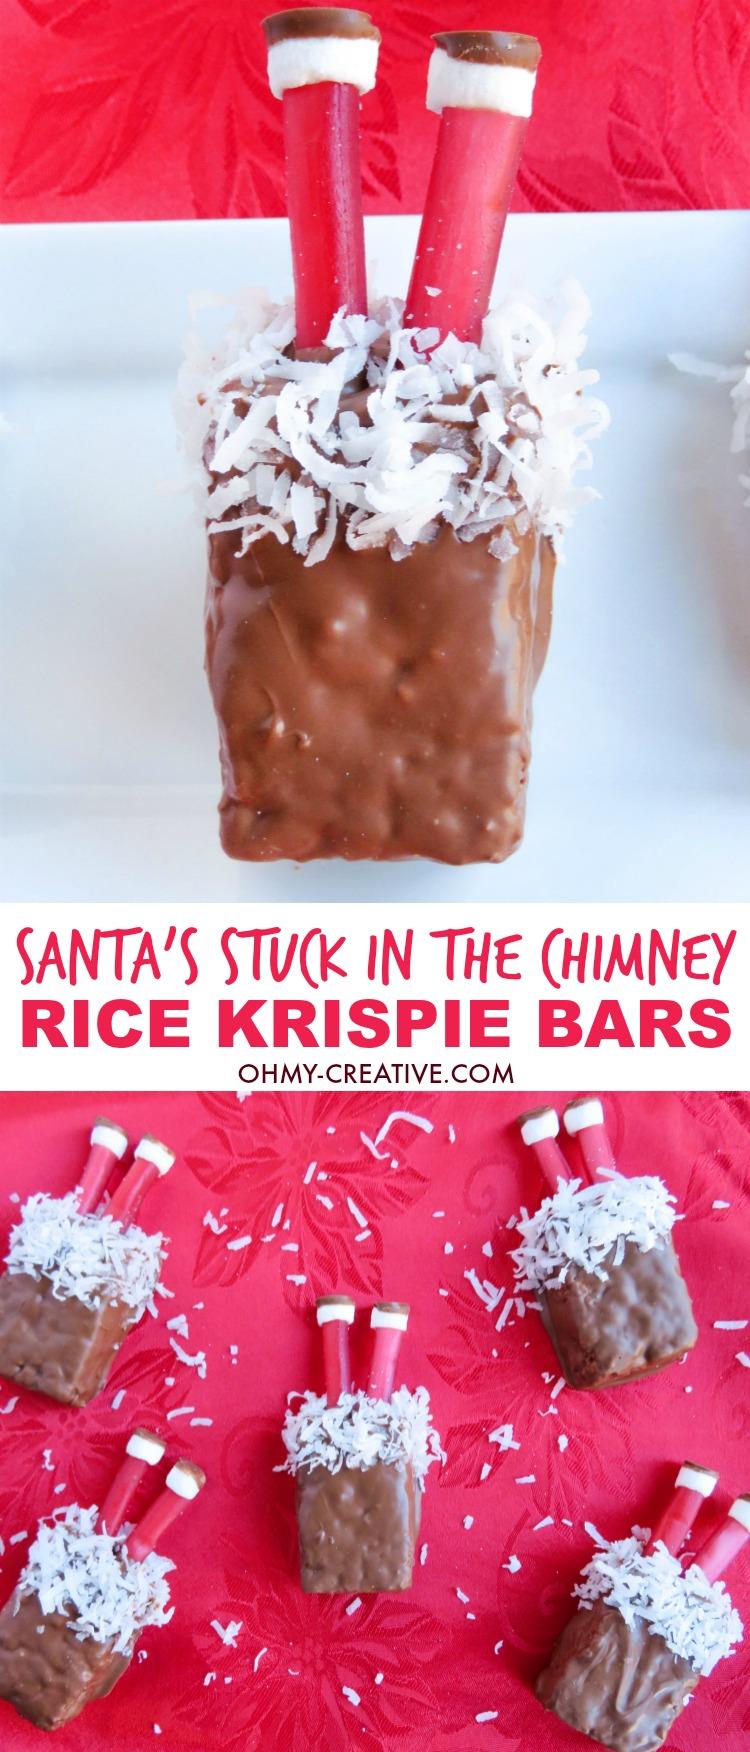 Santa's Stuck in the Chimney Rice Krispie Bars | OHMY-CREATIVE.COM | Rice Krispie Treats | Rice Crispy Treats | Christmas Rice Krispie Treats | Rice Krispie Treat Ideas | Santa Treat | Santa Dessert | Christmas Treat | Santa Legs Treat | Christmas Dessert